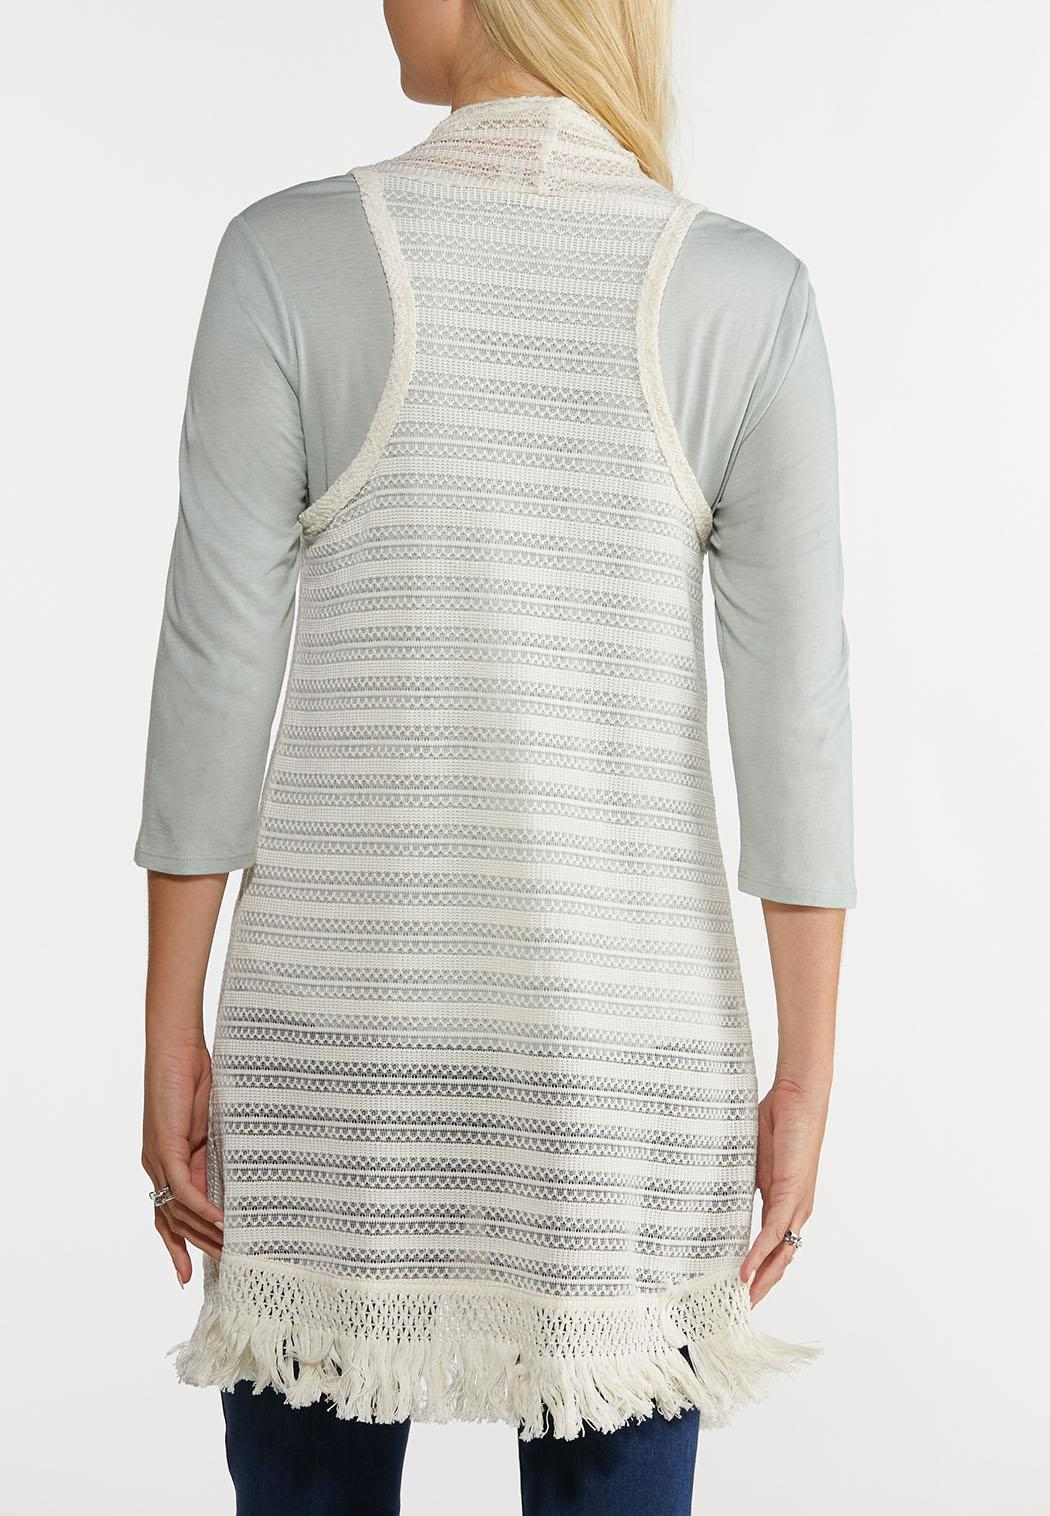 Ivory Fringe Vest (Item #44229947)